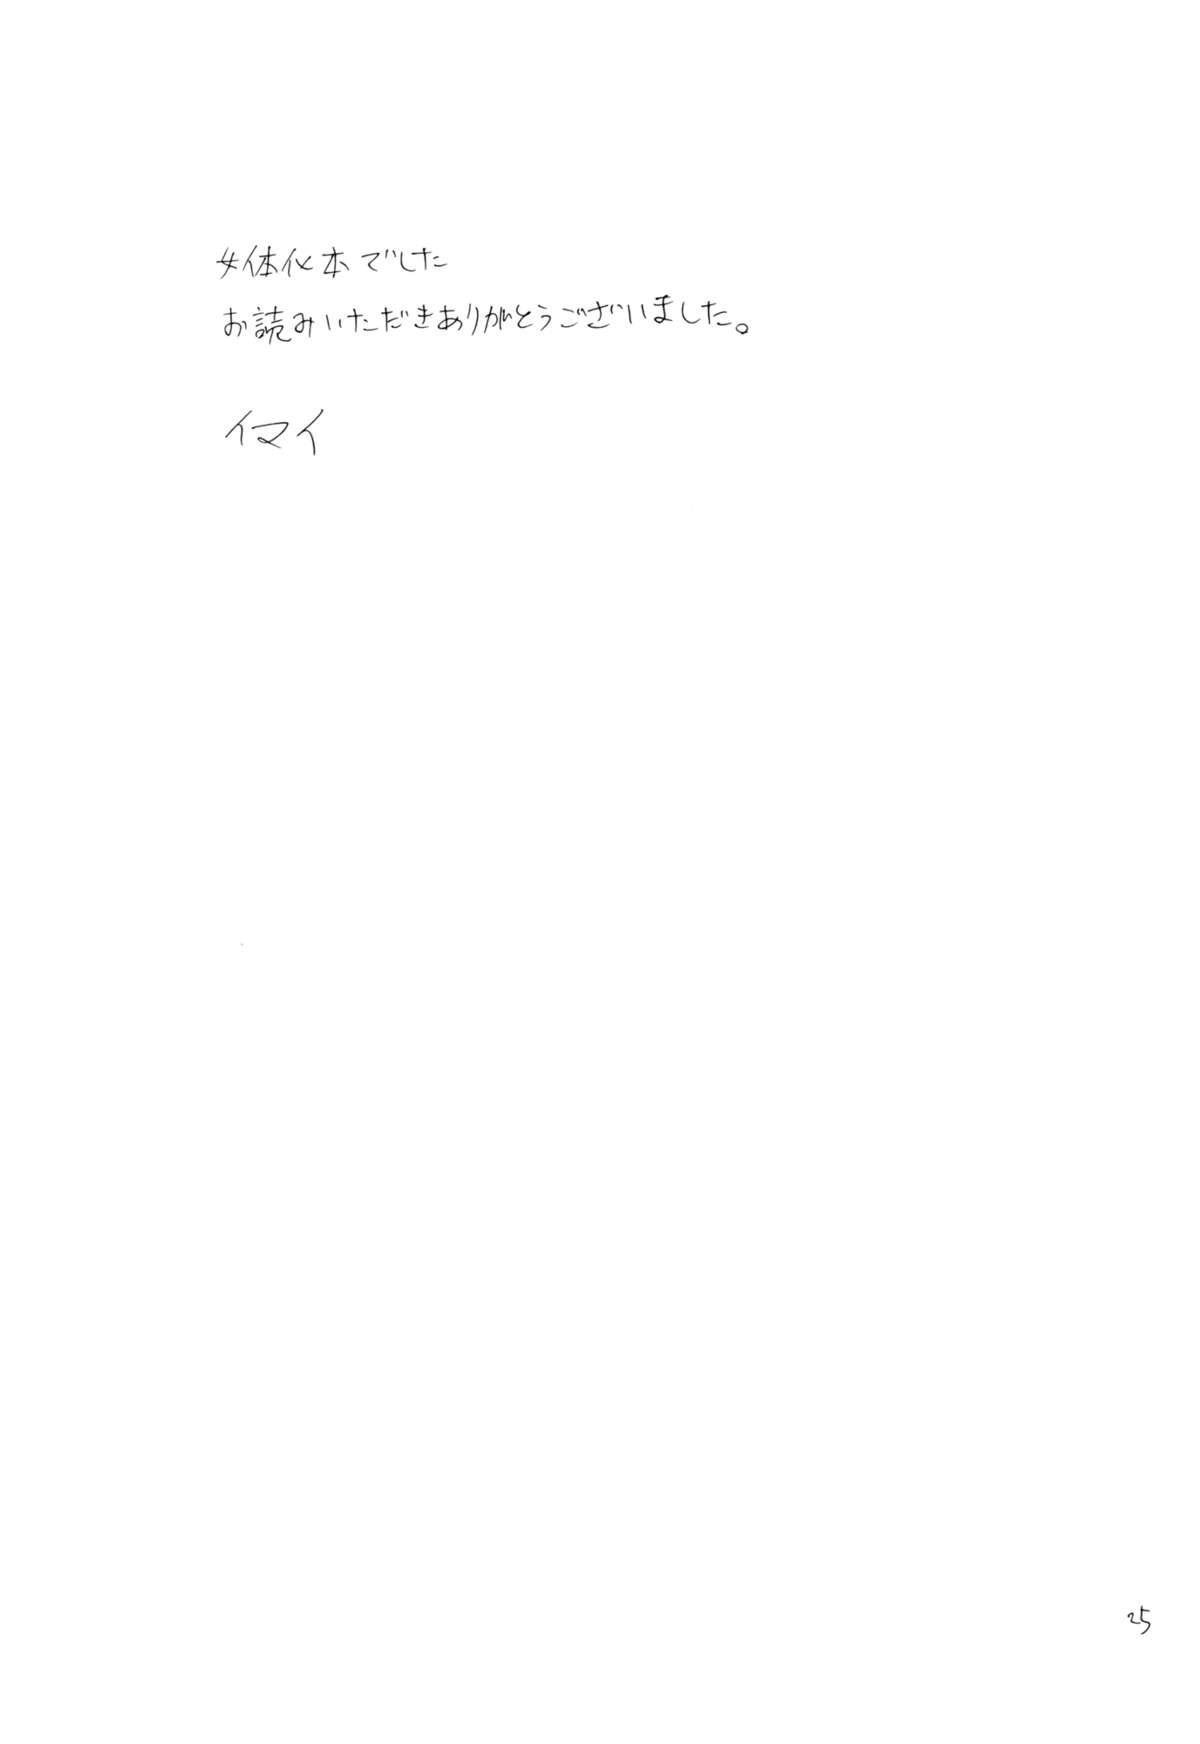 Three-Man Cell ga Iroiro Okashii 22